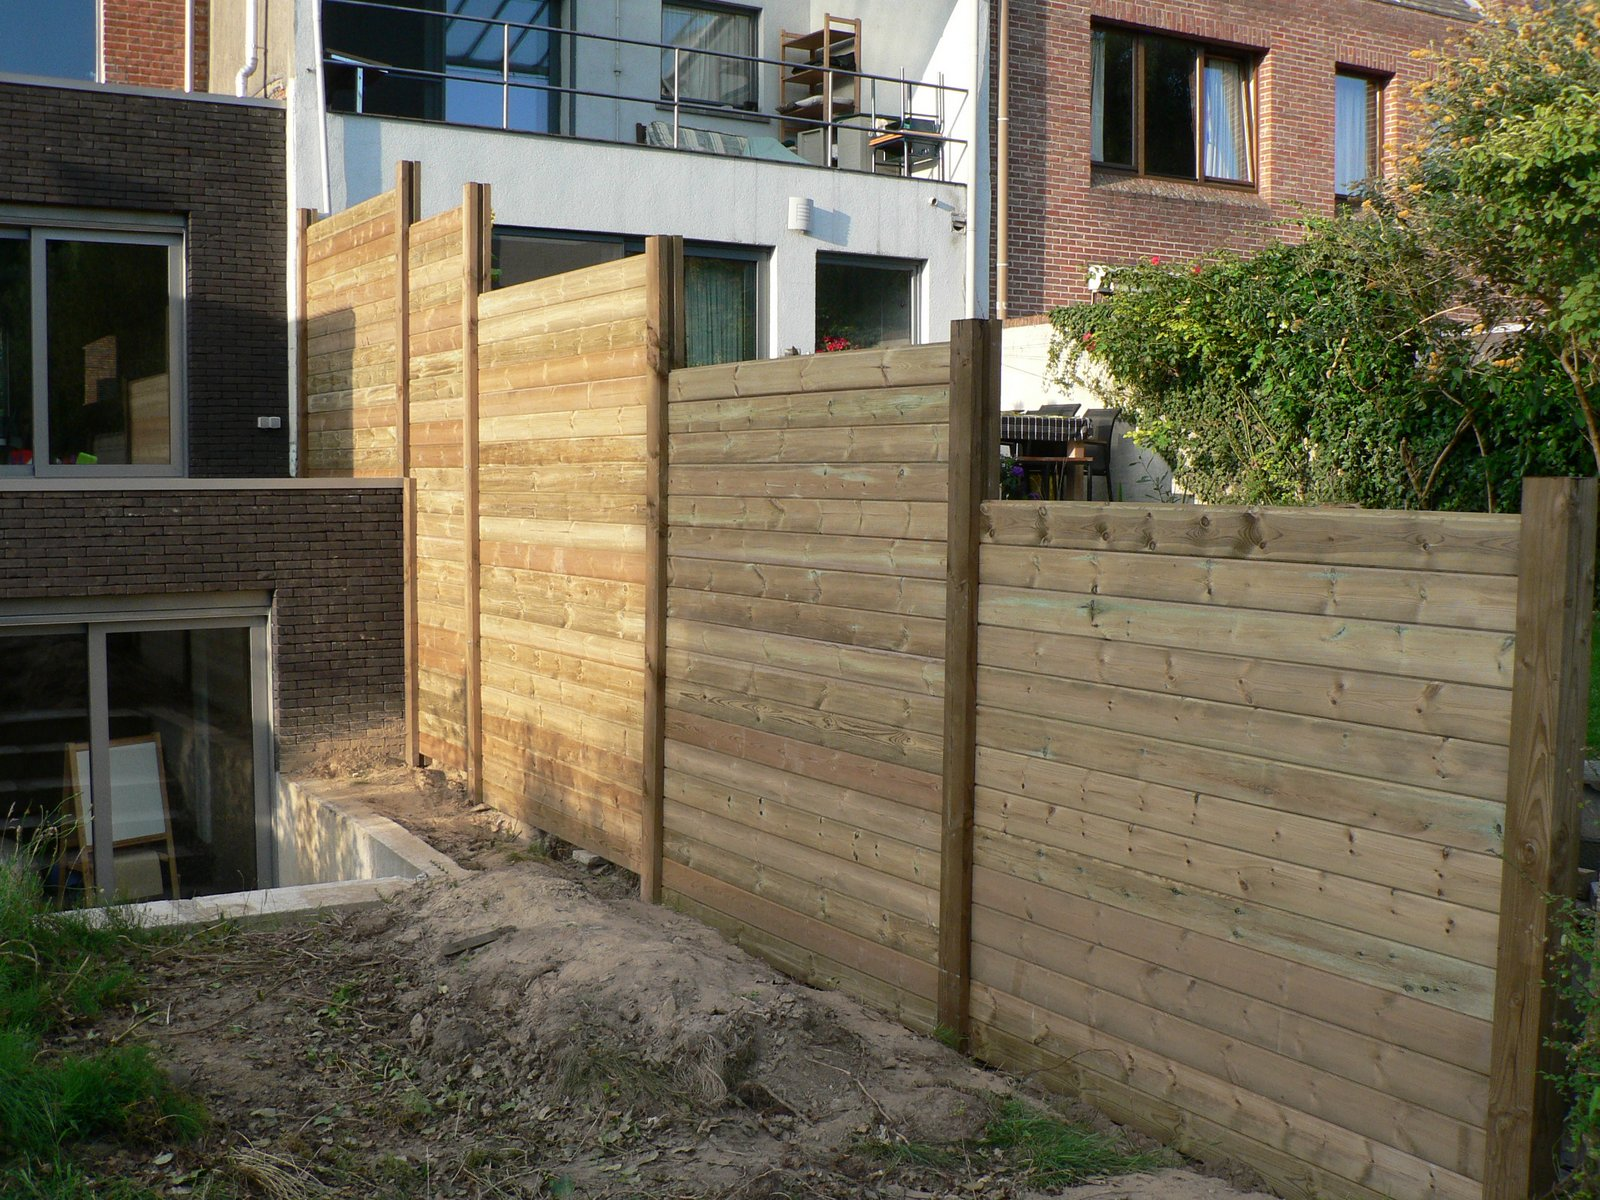 Ons huisje houten tuinafscheiding - Scheiding houten ...